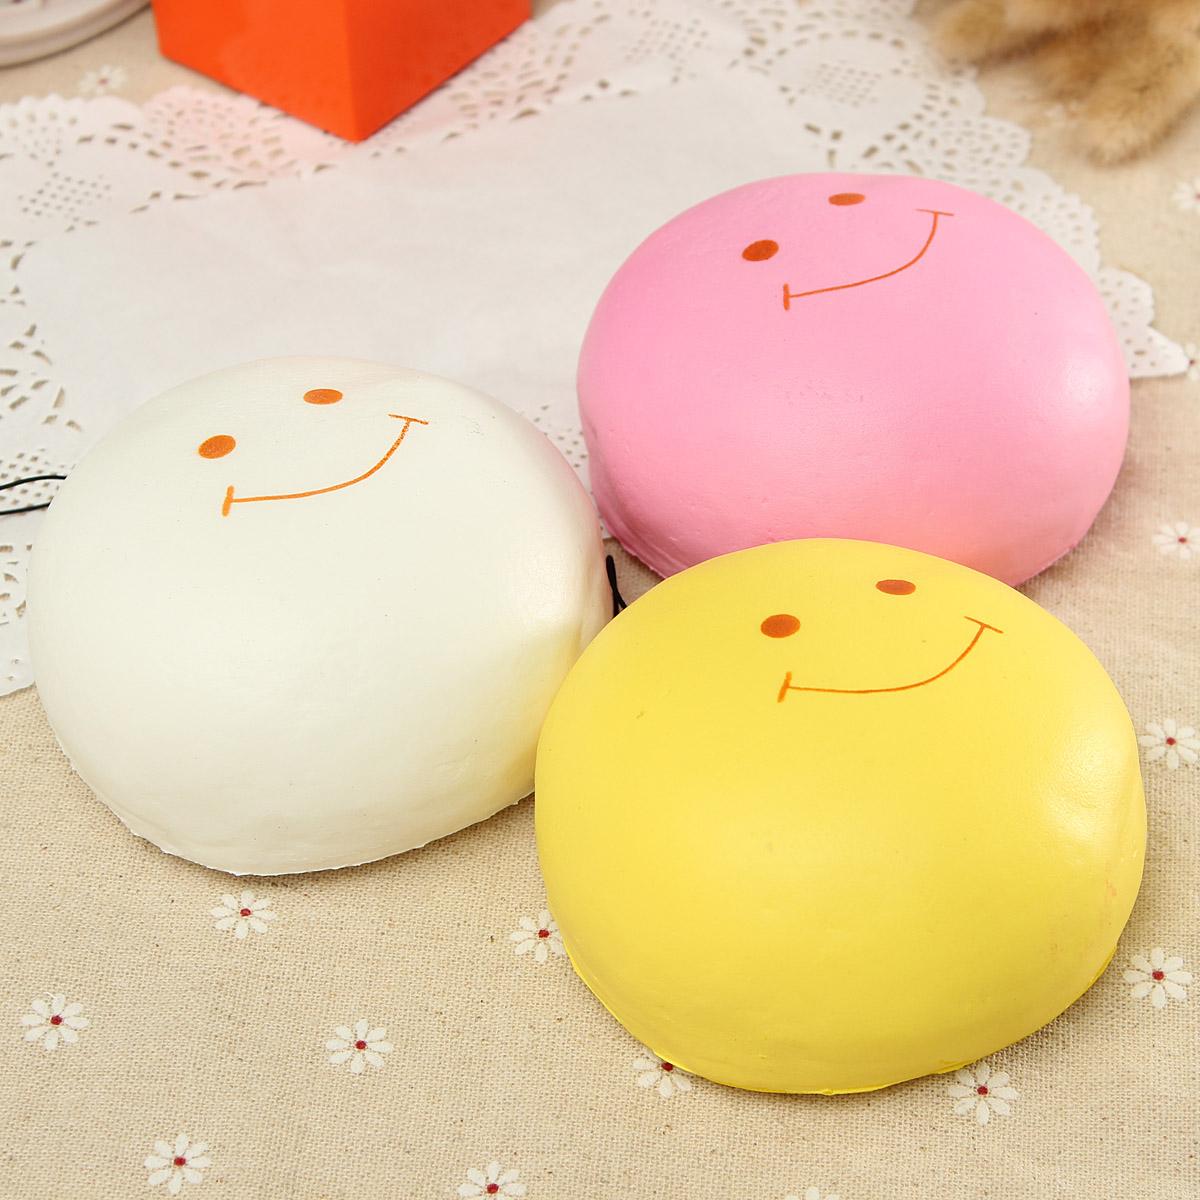 Squishy Jumbo Marshmallow : 10cm Jumbo Kawaii Smile Marshmallow Squishy Bread Keychain Bag Phone Charm Strap eBay